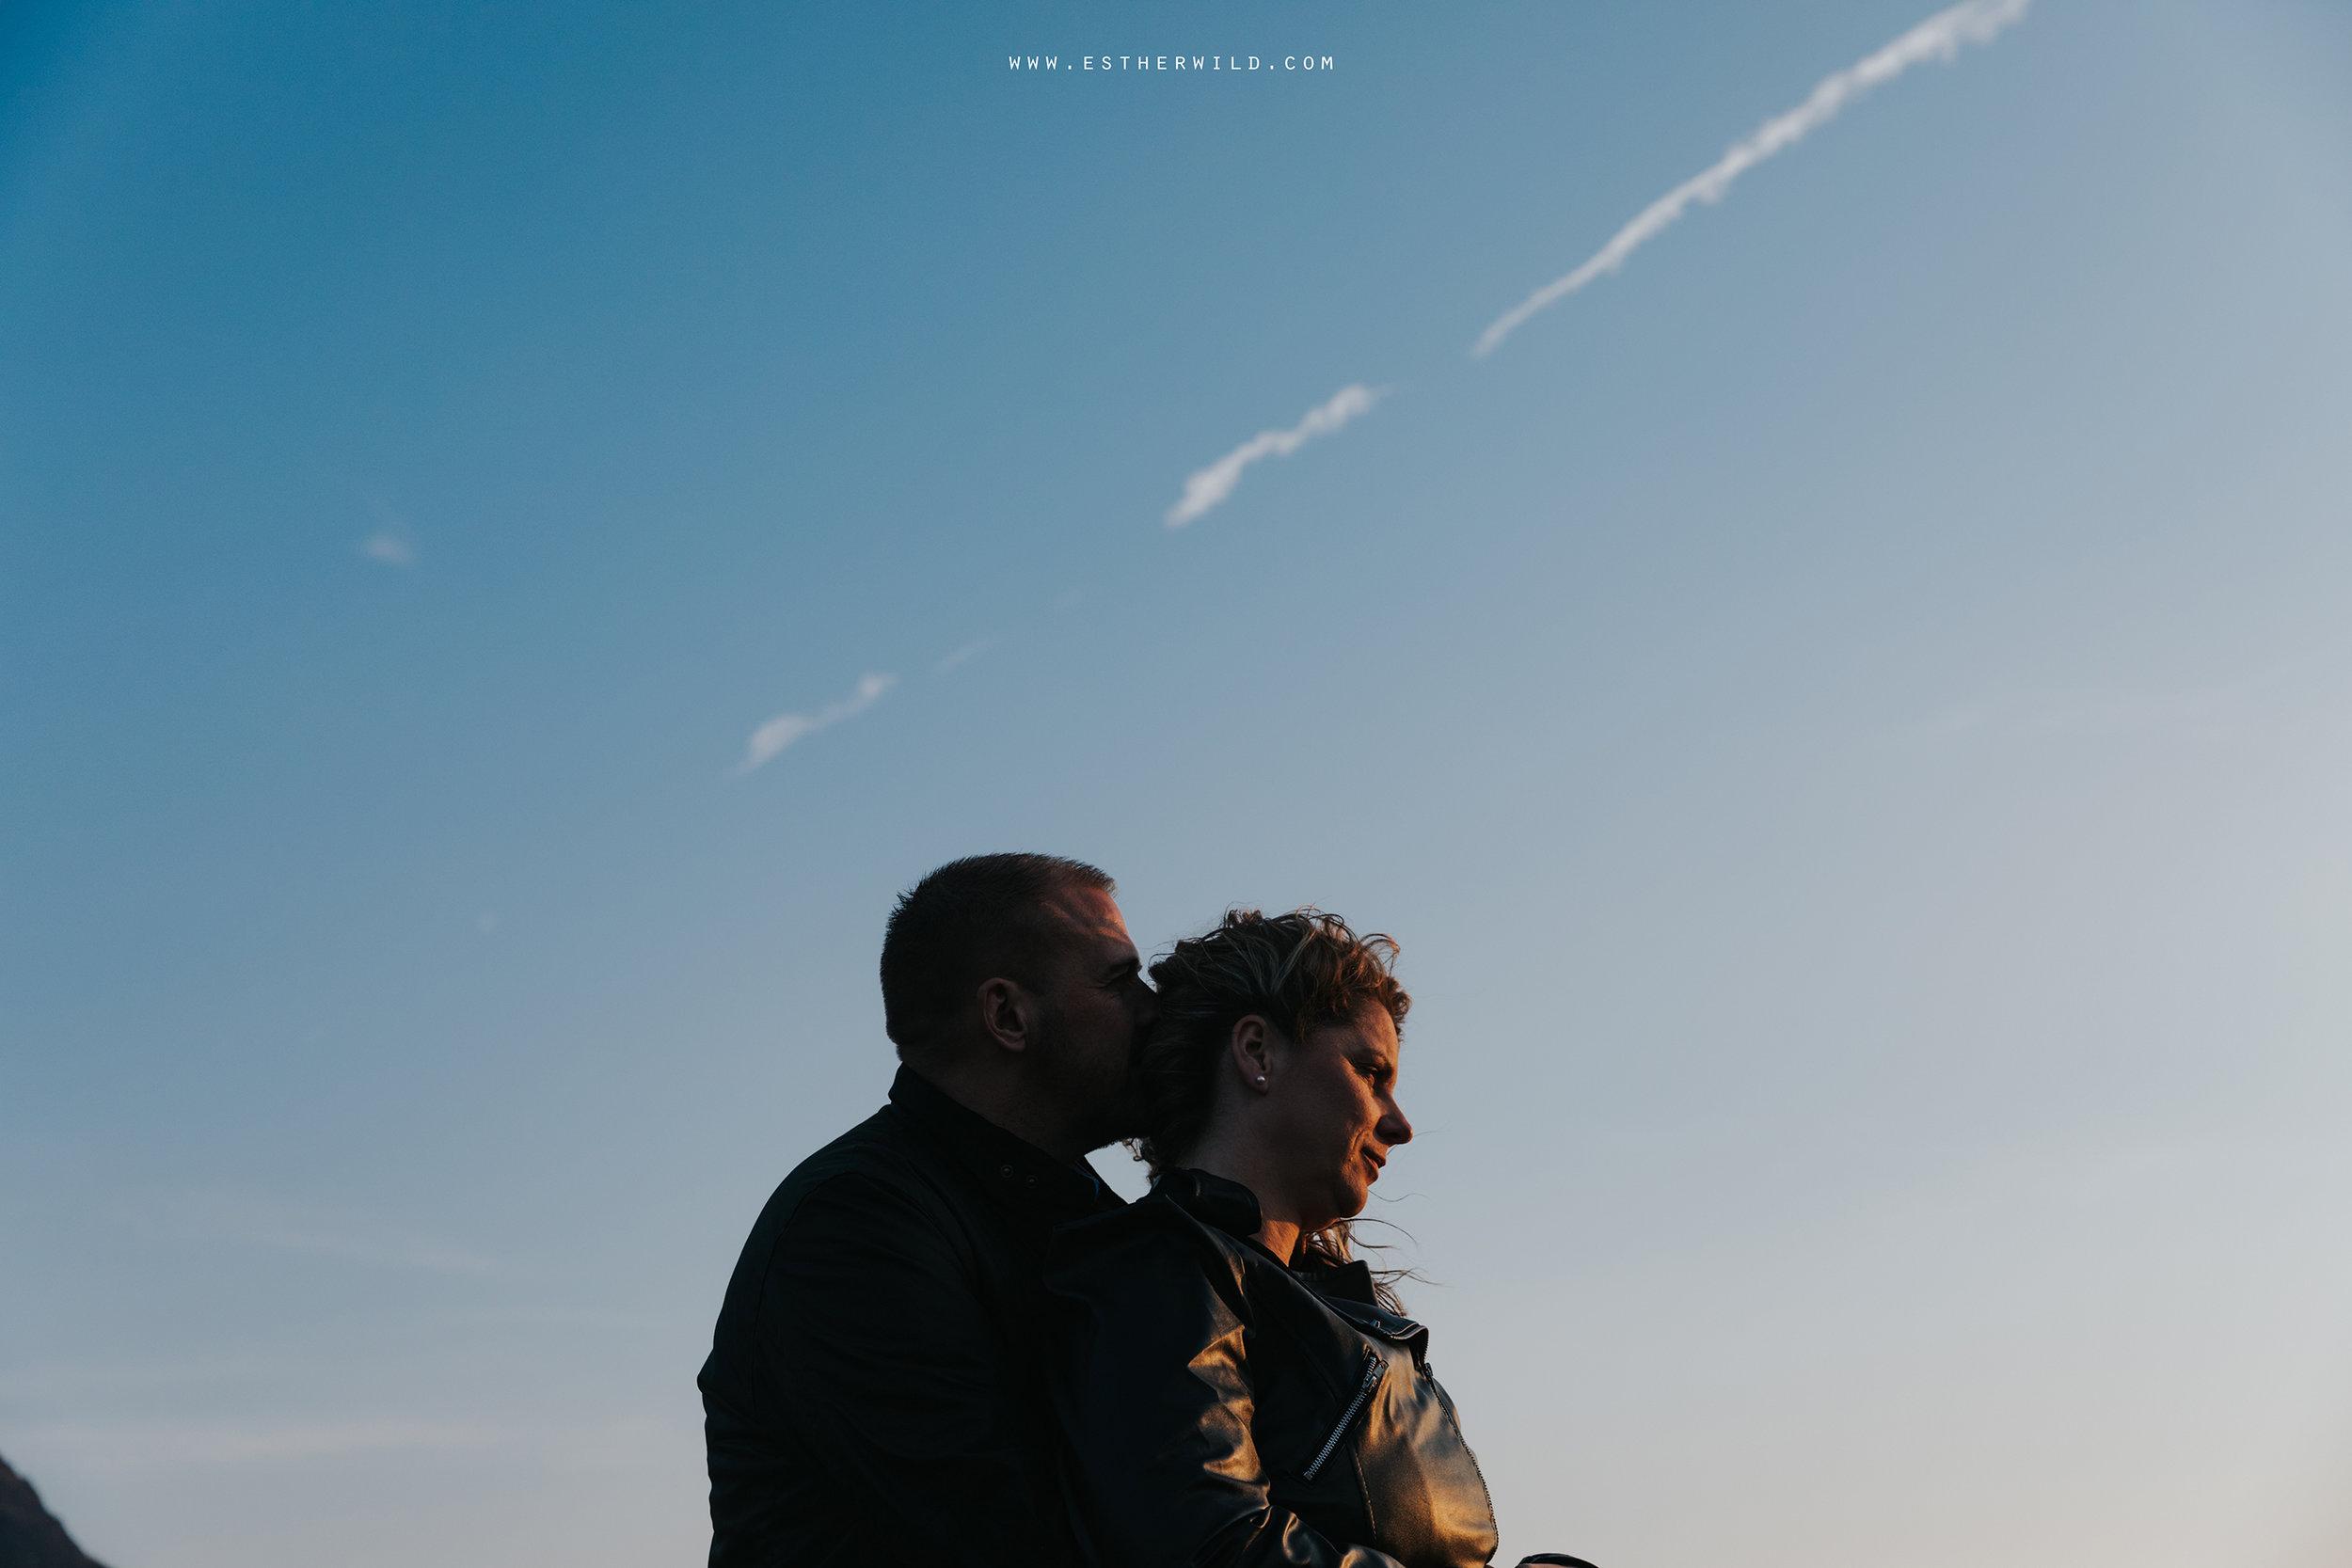 Cumbria_Lake_District_Wasdale_Wedding_Photographer_Destination_Engagement_Anniversary_Esther_Wild_IMG_4708.jpg